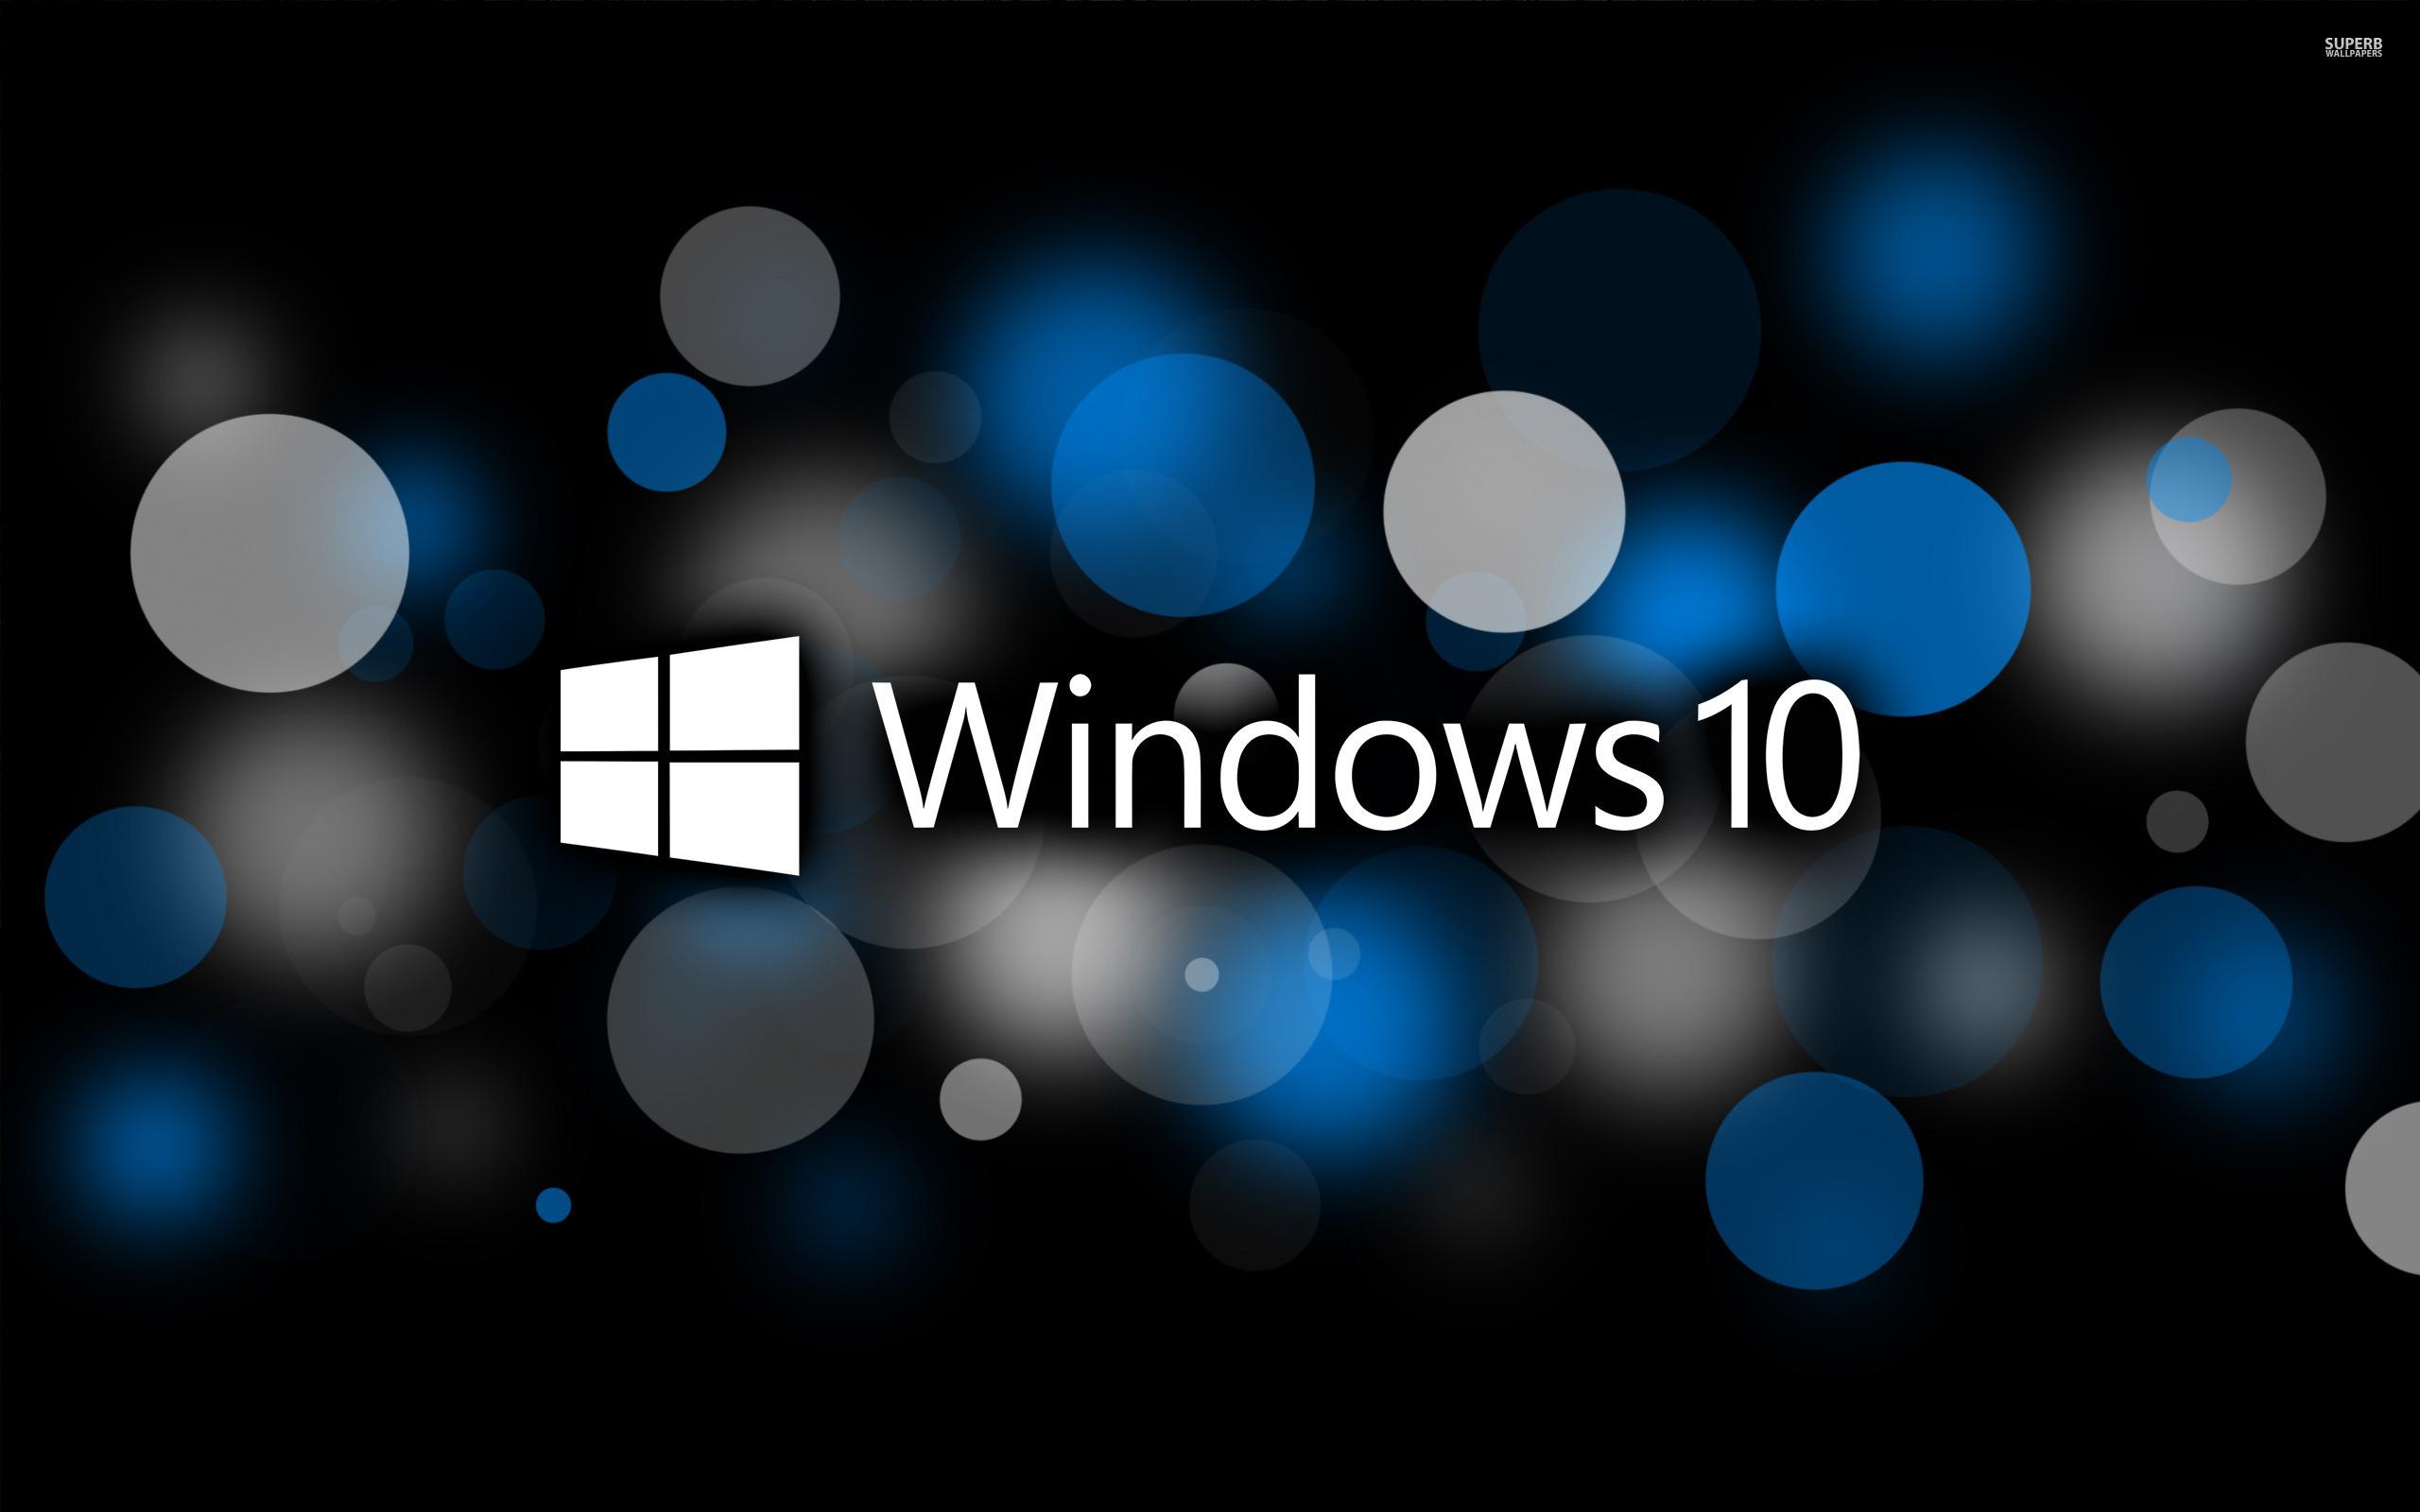 Free Download Windows 10 Hd Desktop Wallpaper 14125